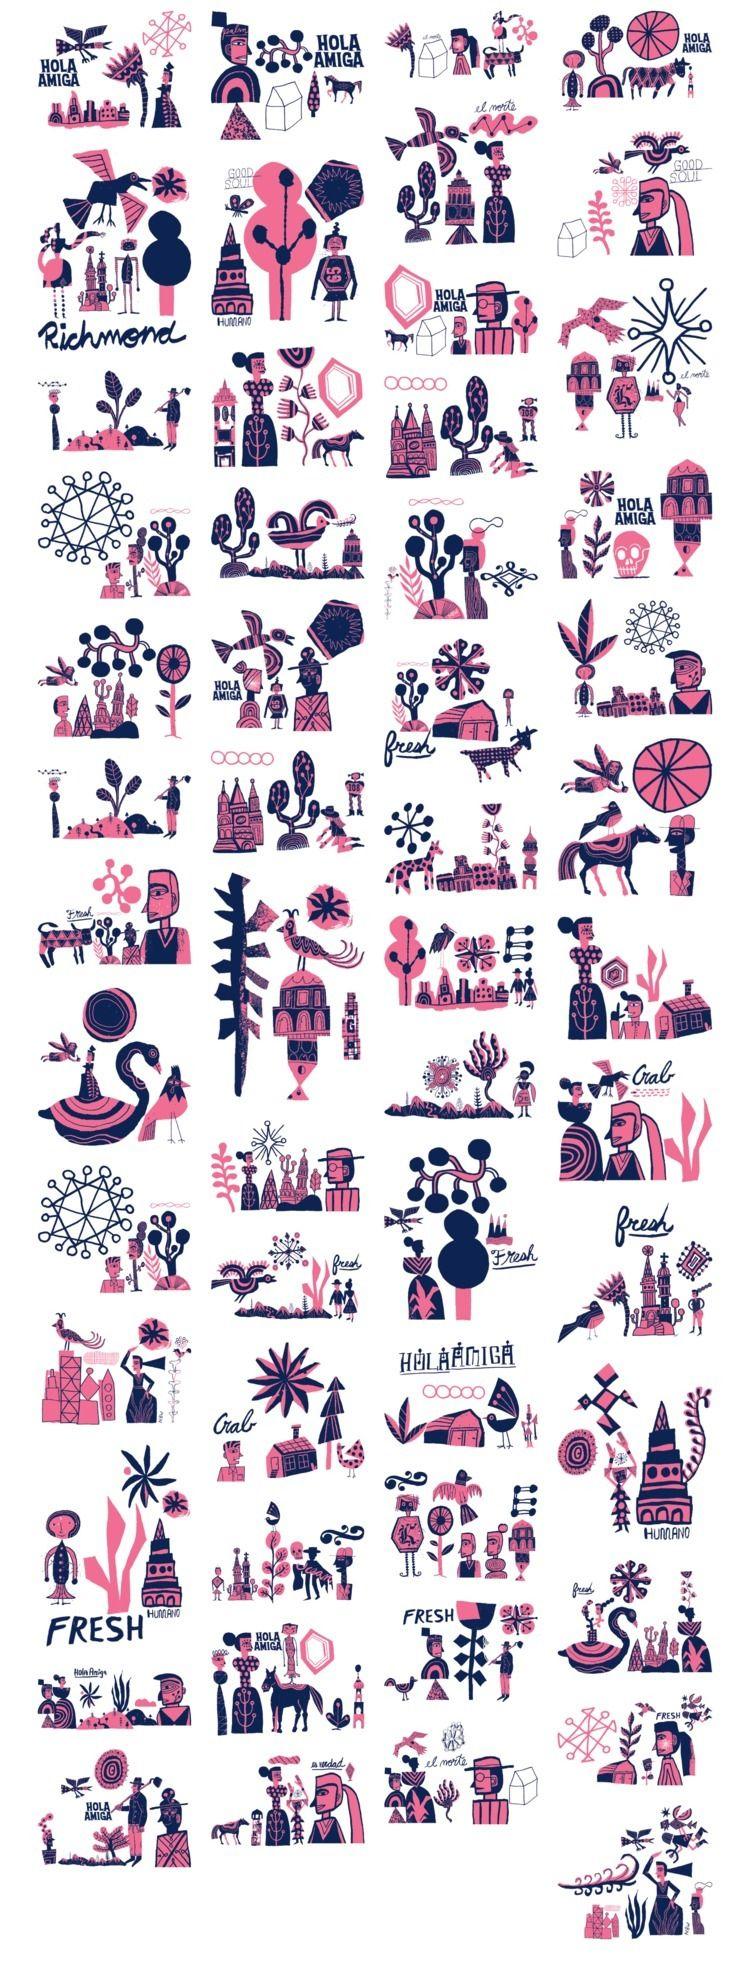 images composition generator - illustration - n8wn8w | ello